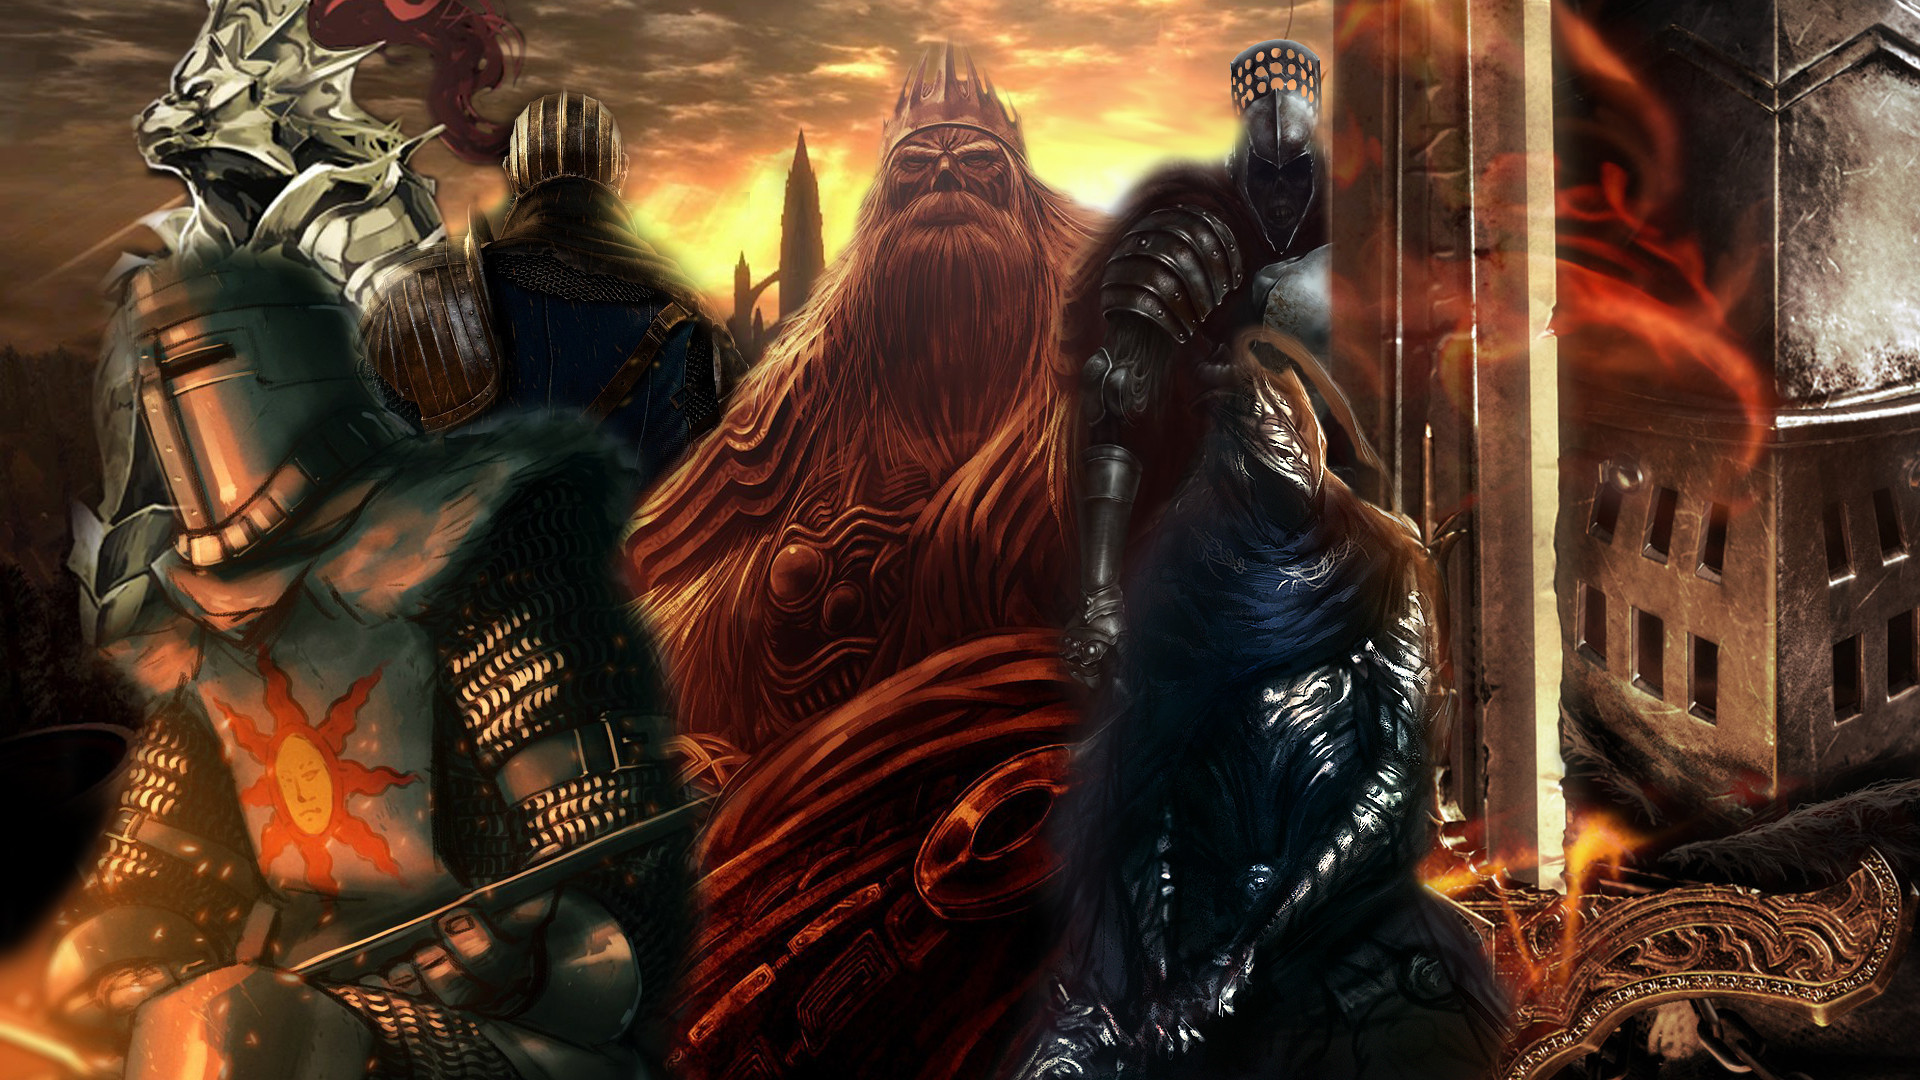 Dark Souls 3 Live Wallpaper (81+ Images